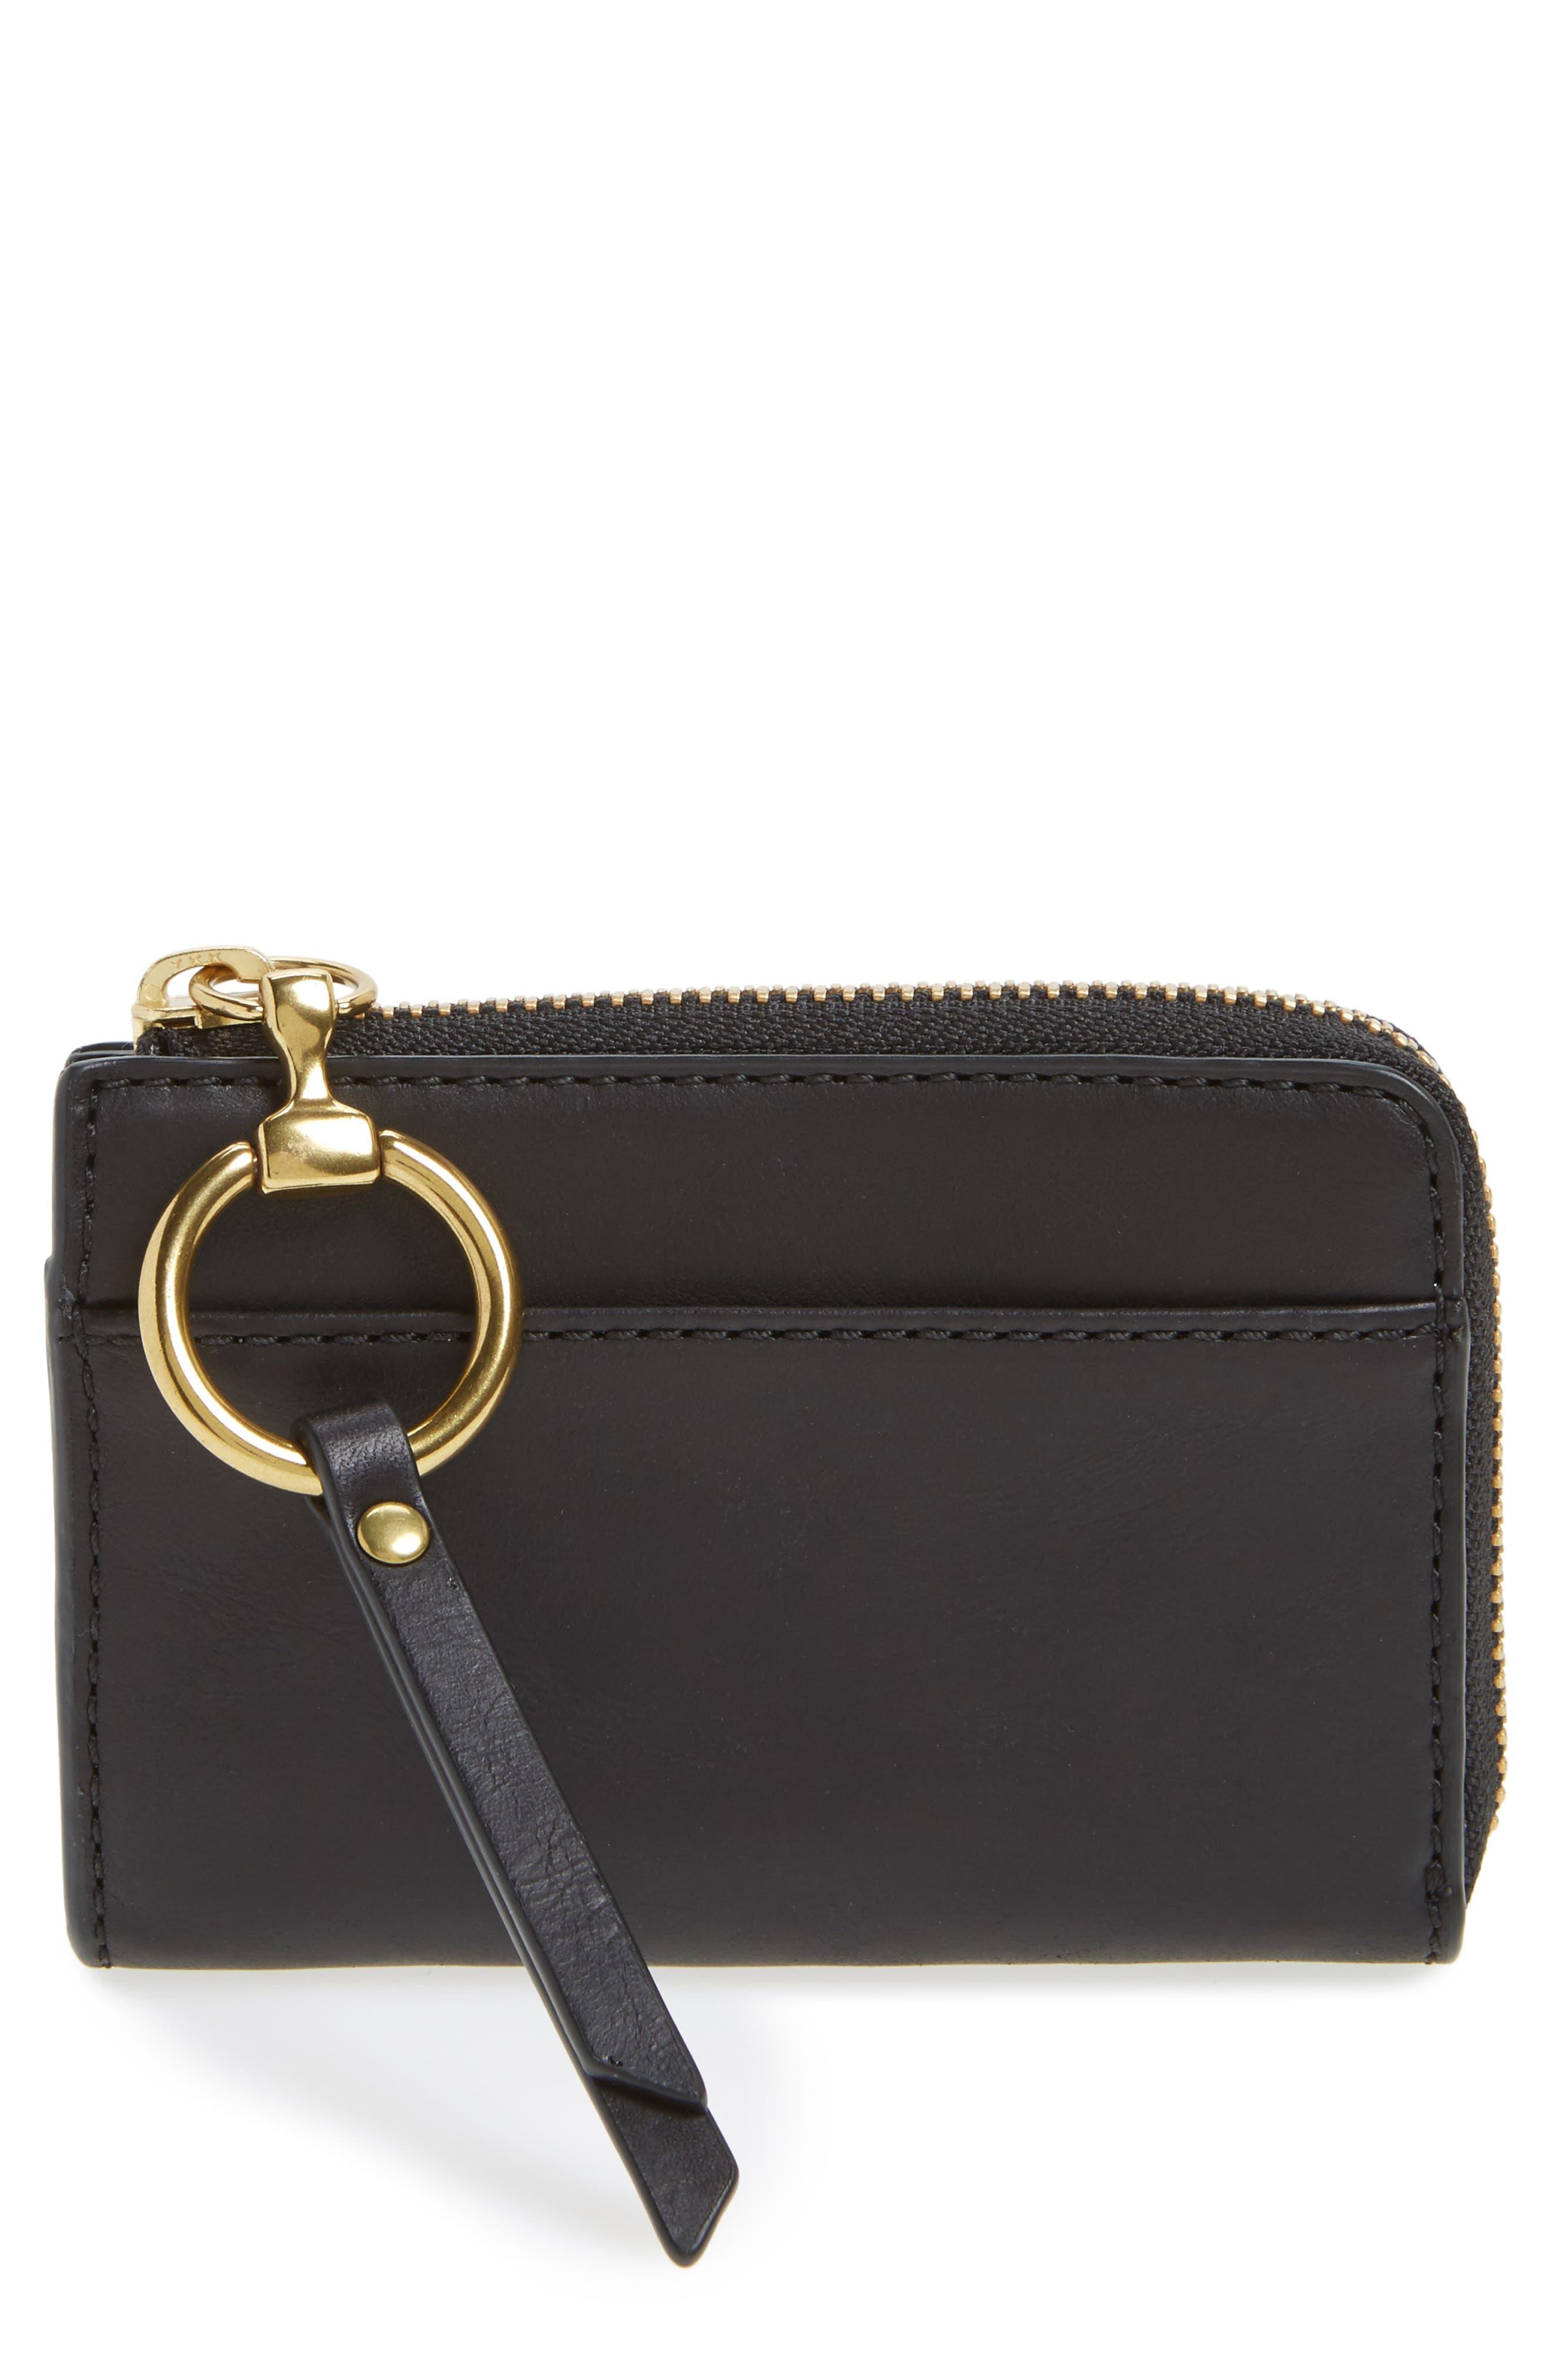 Frye Small Ilana Harness Zip Leather Wallet